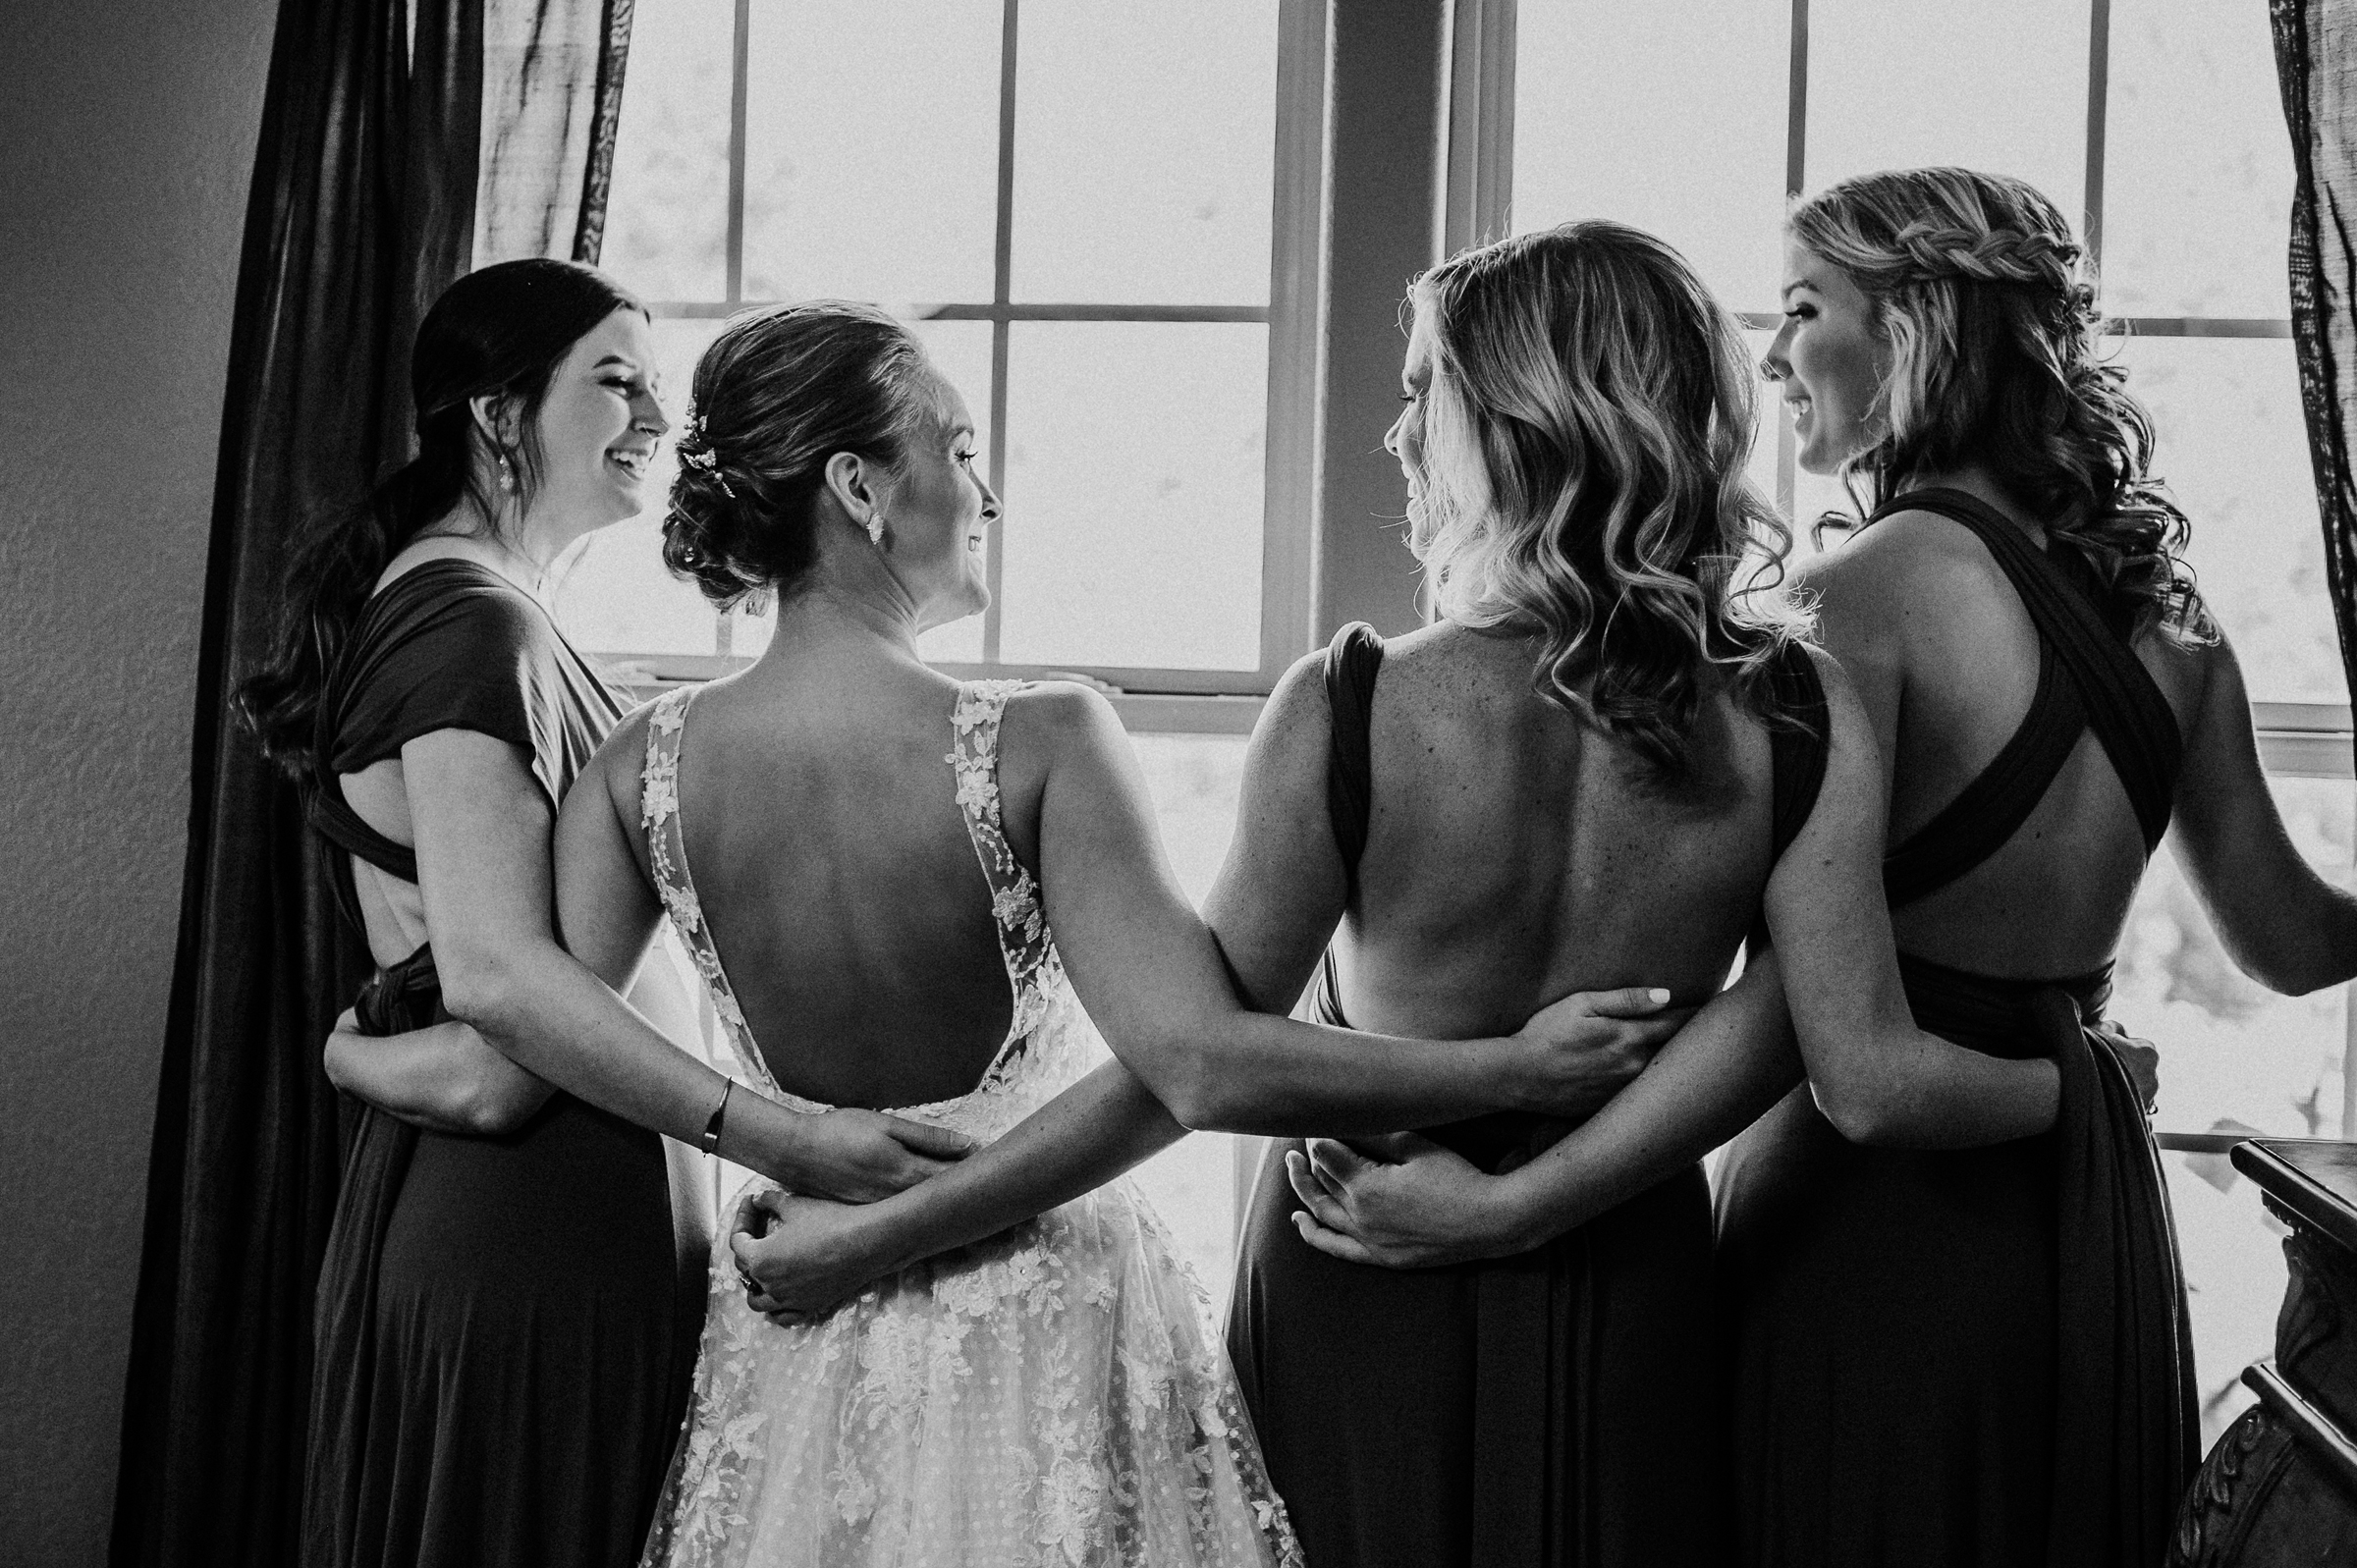 Bride and bridesmaids at window